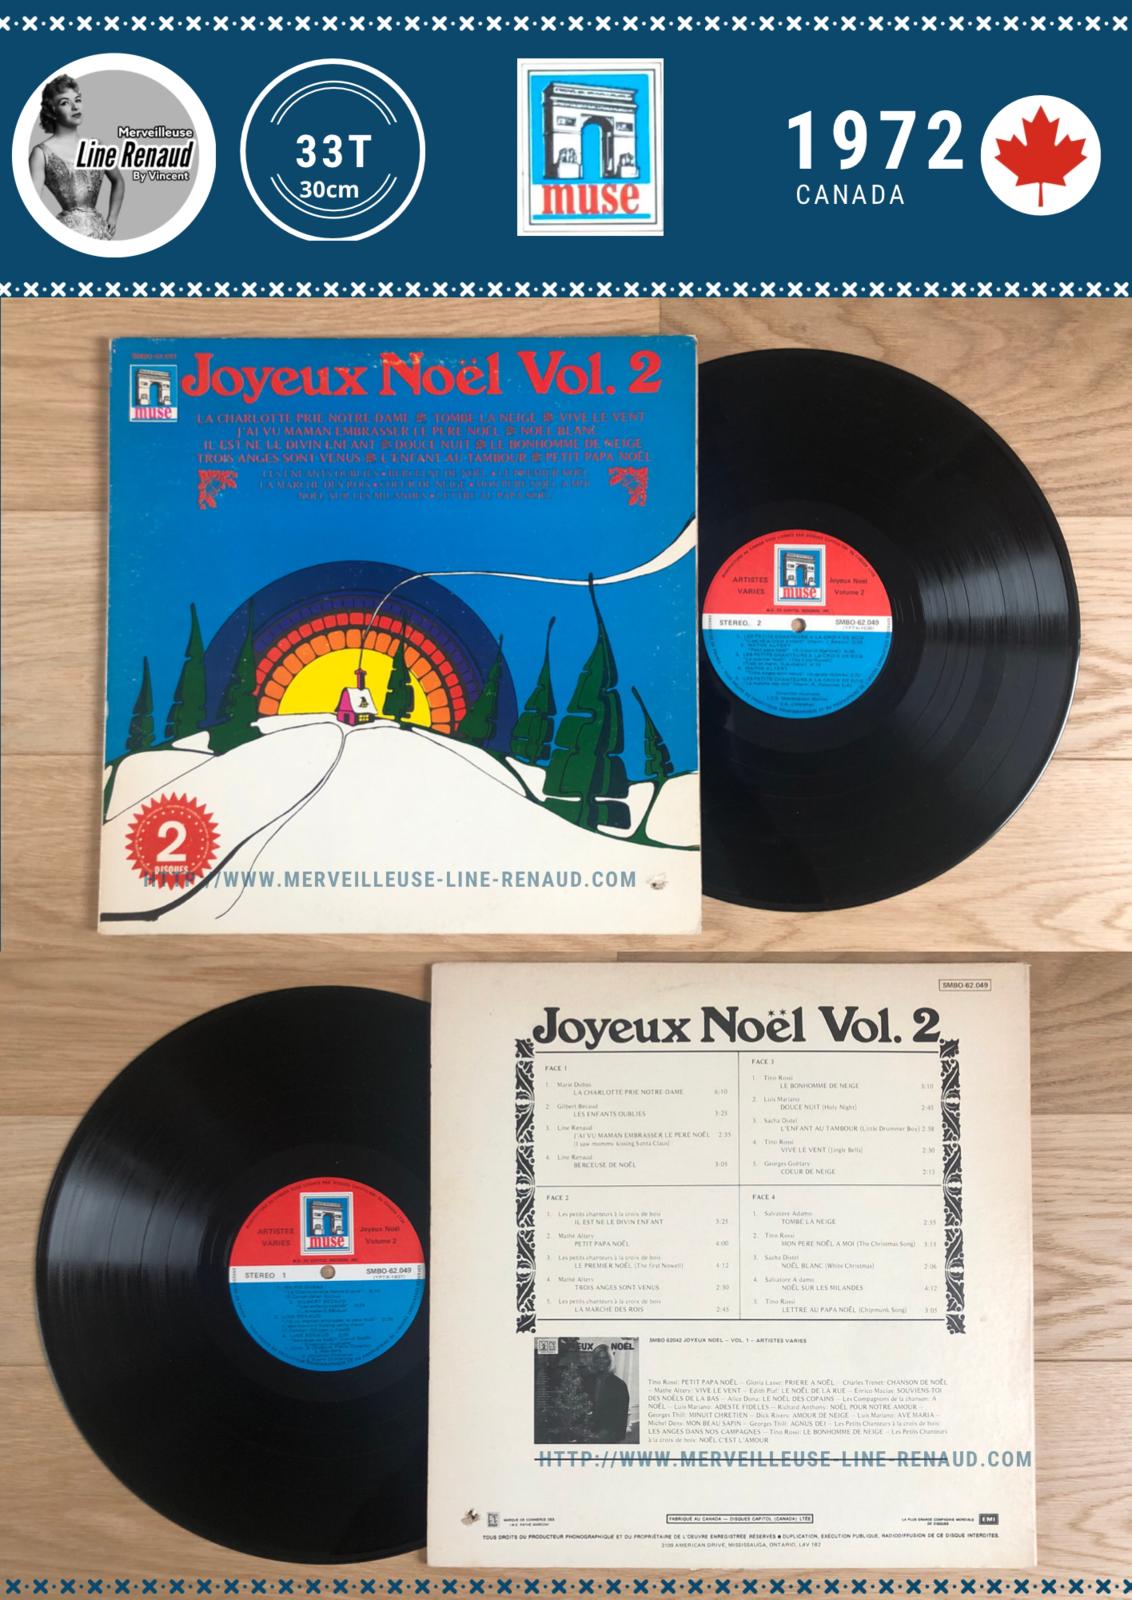 33 TOURS: 1972 Muse/EMI - 2 x 33 Tours - SMBO 62049 - Joyeux Noël Vol. 2 (Canada)